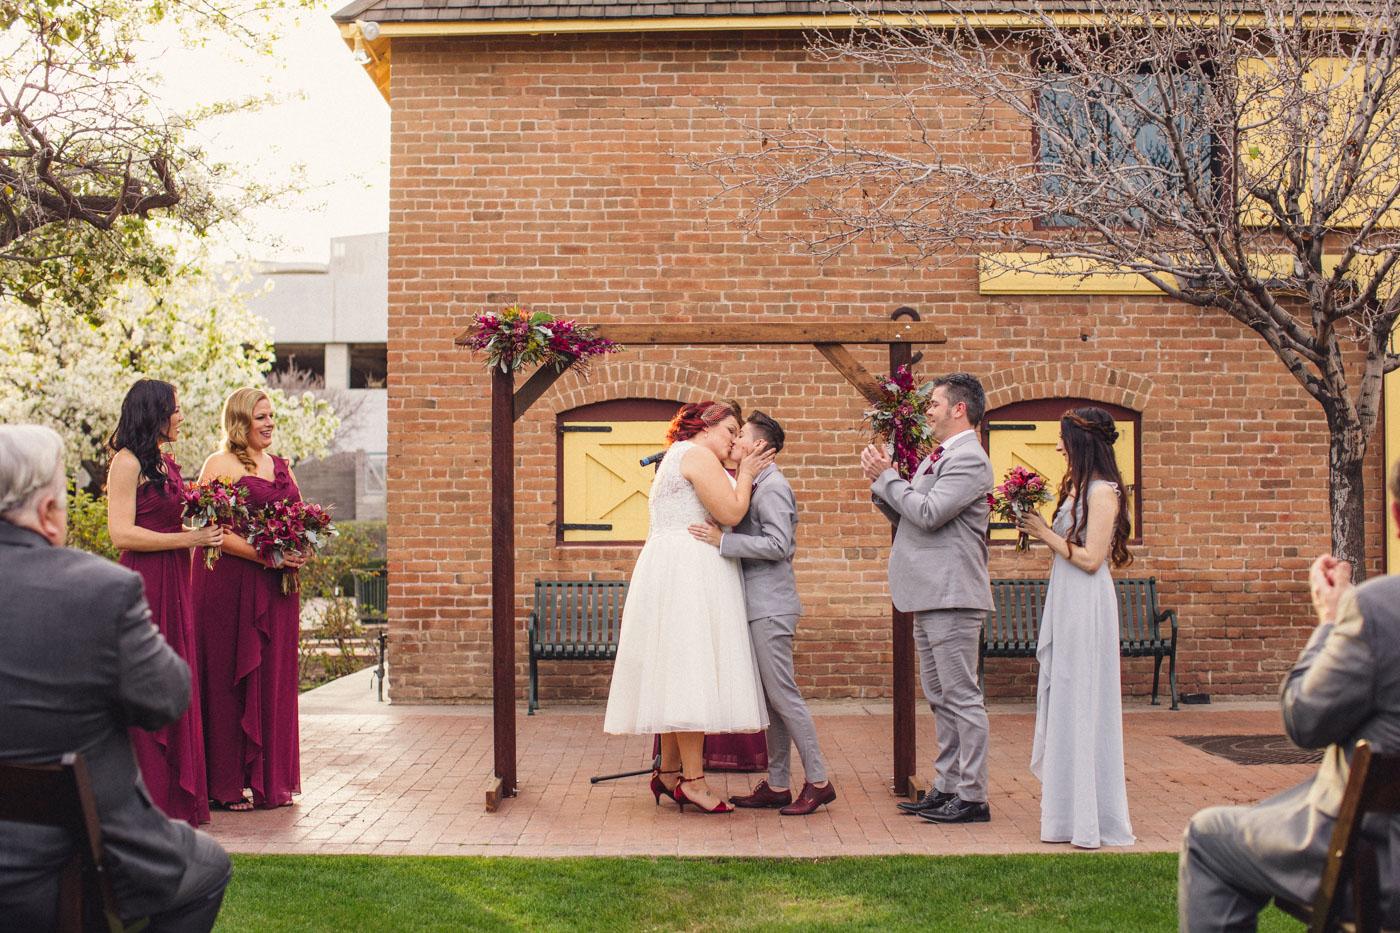 heritage-square-wedding-ceremony-kiss